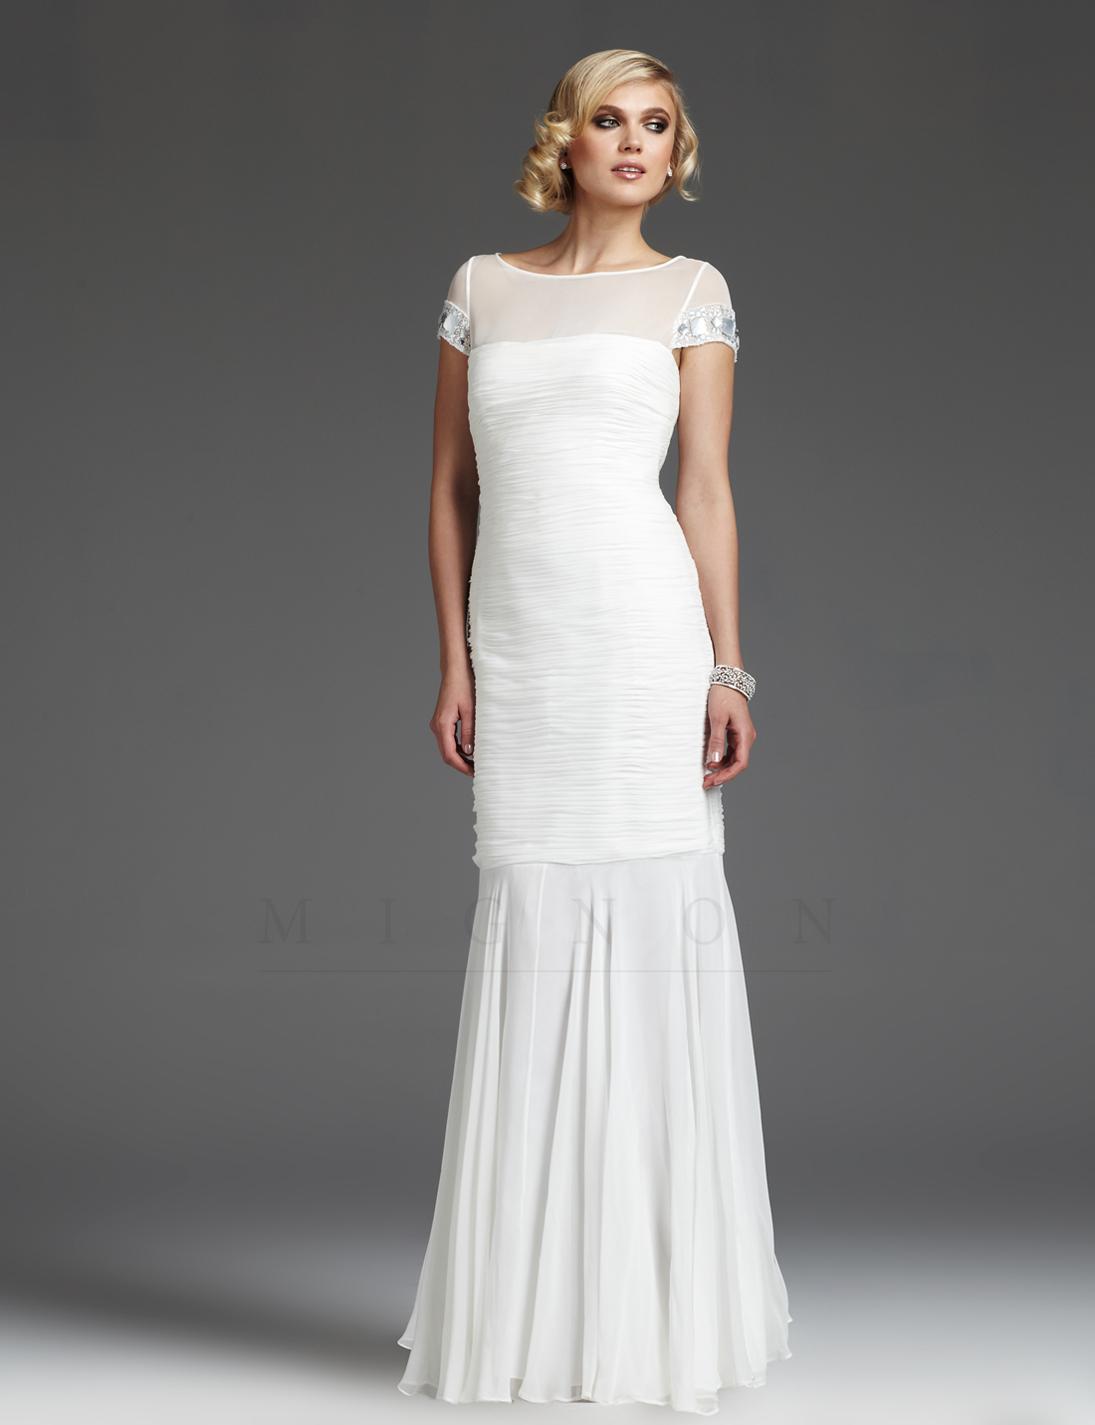 WhiteAzalea Simple Dresses Cap Sleeve Wedding Dress